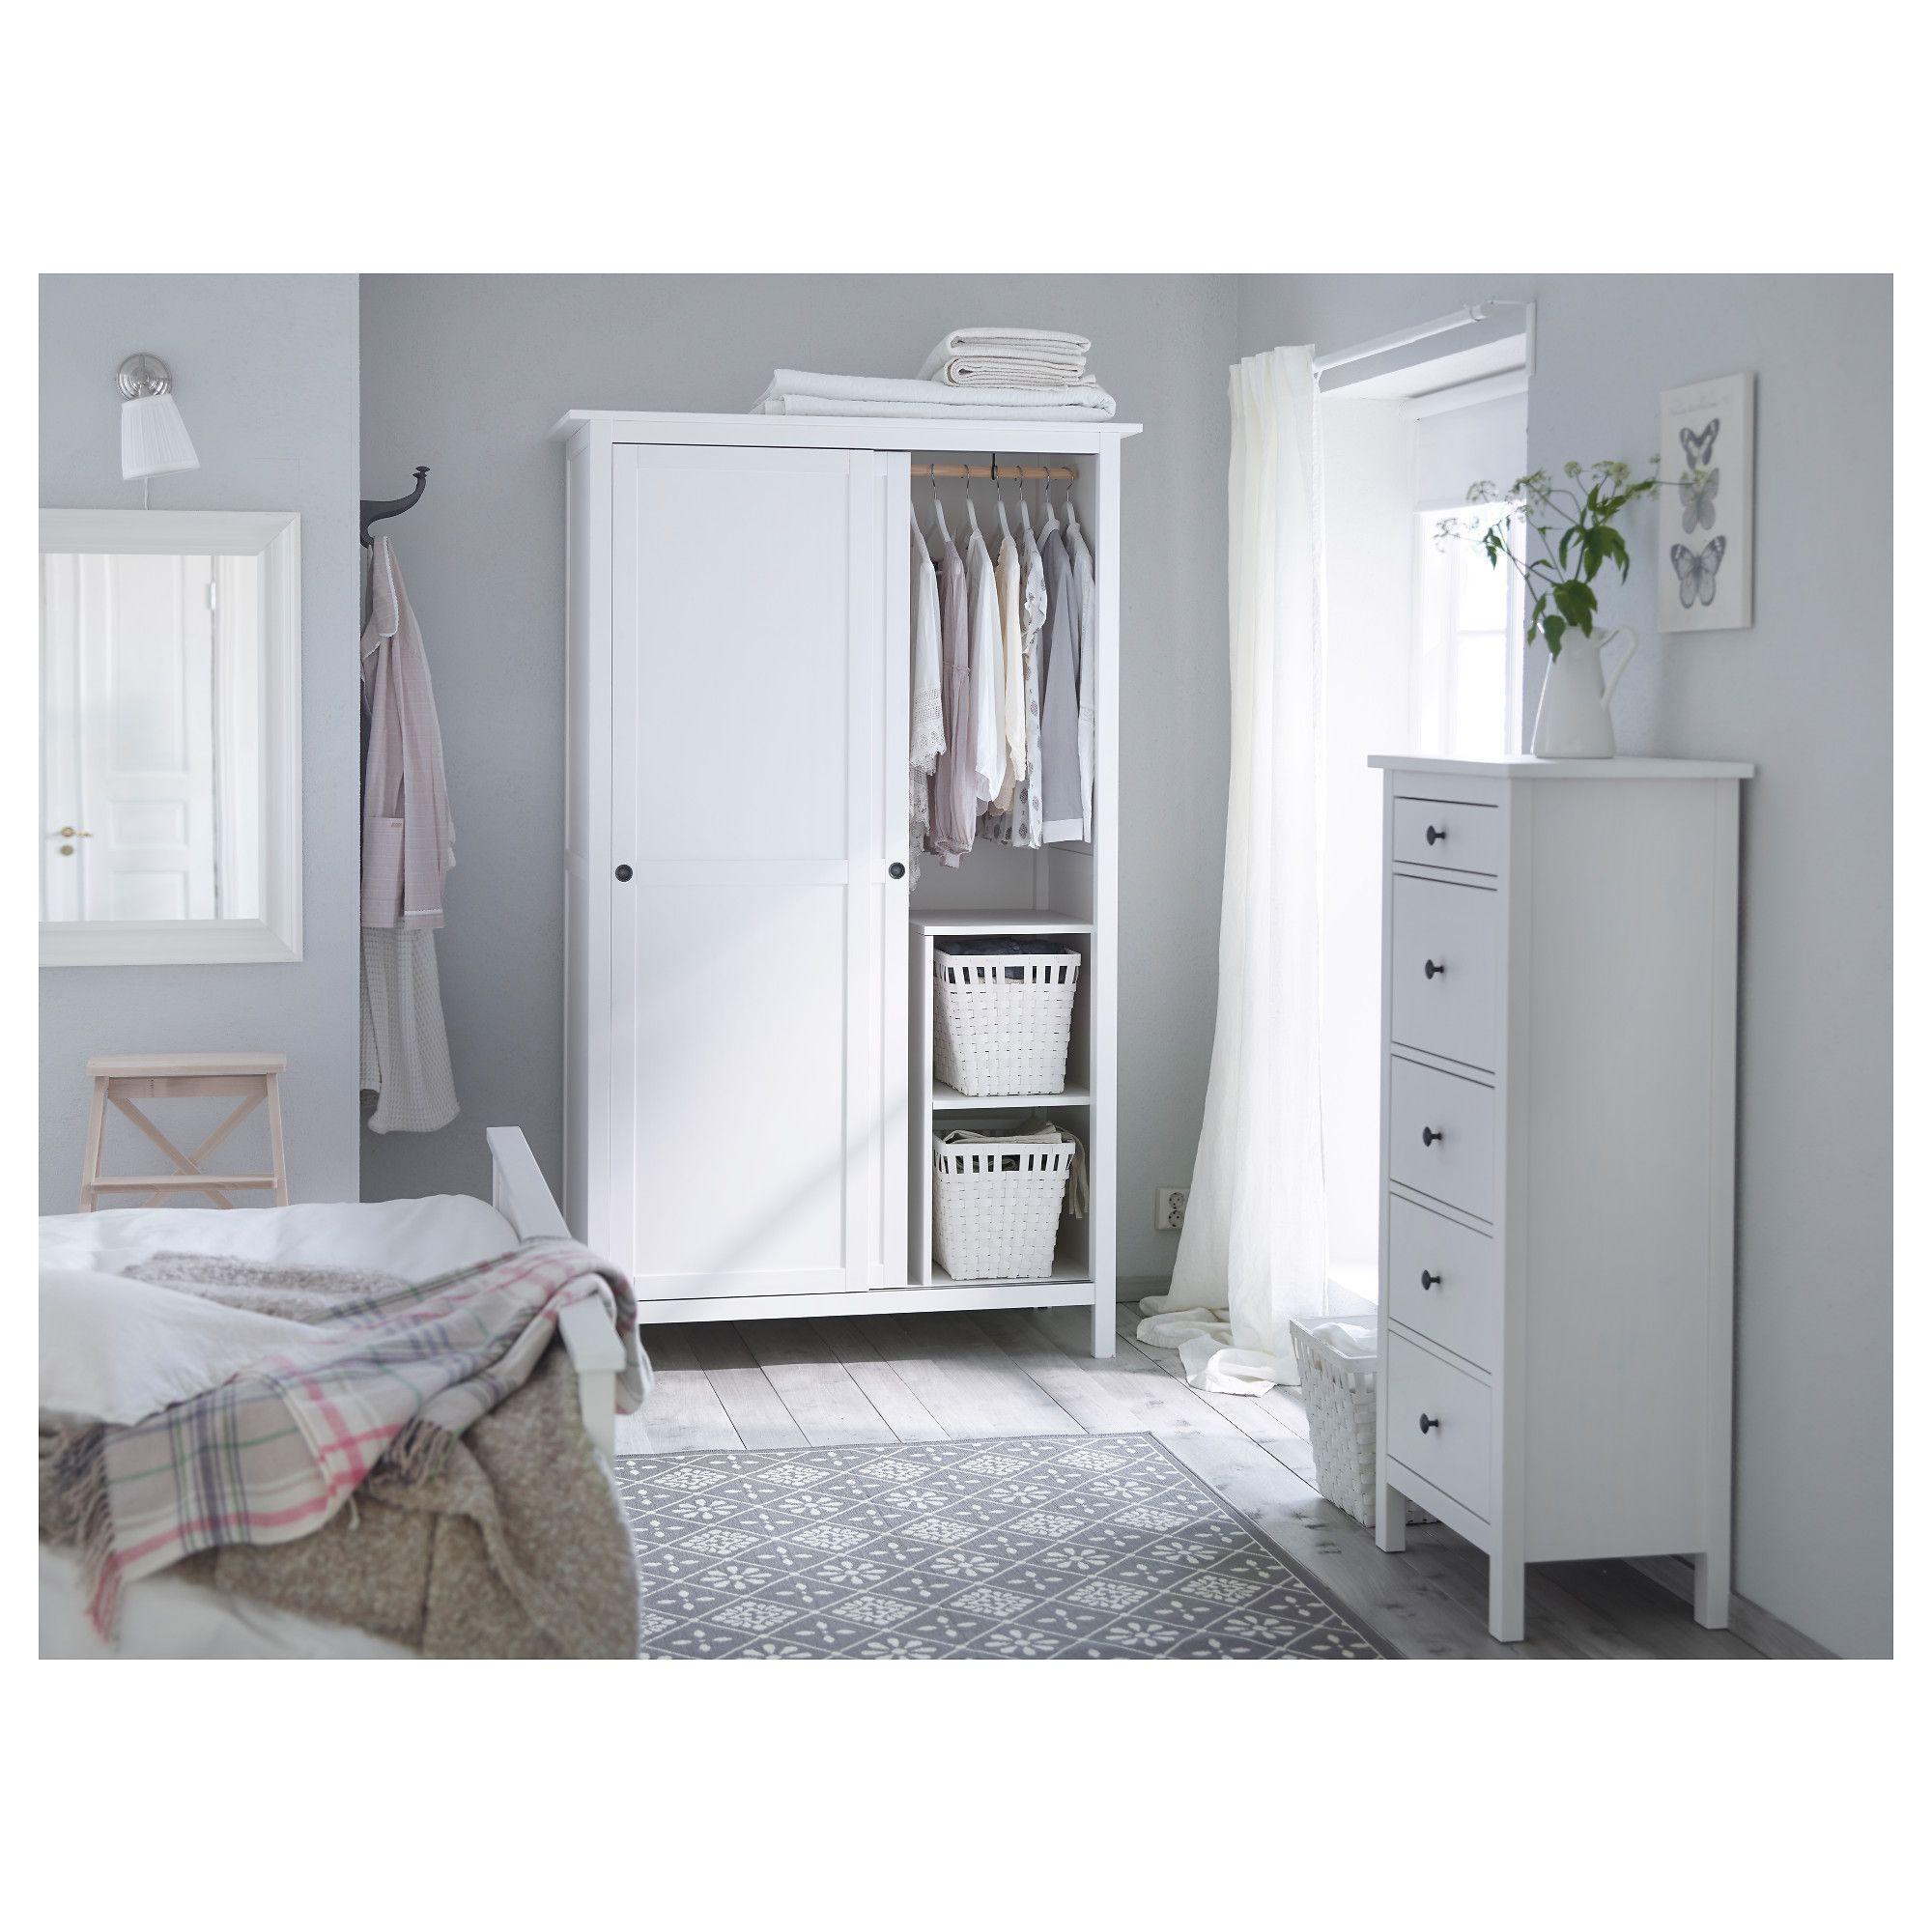 IKEA - HEMNES 5-drawer Chest White Stain In 2019